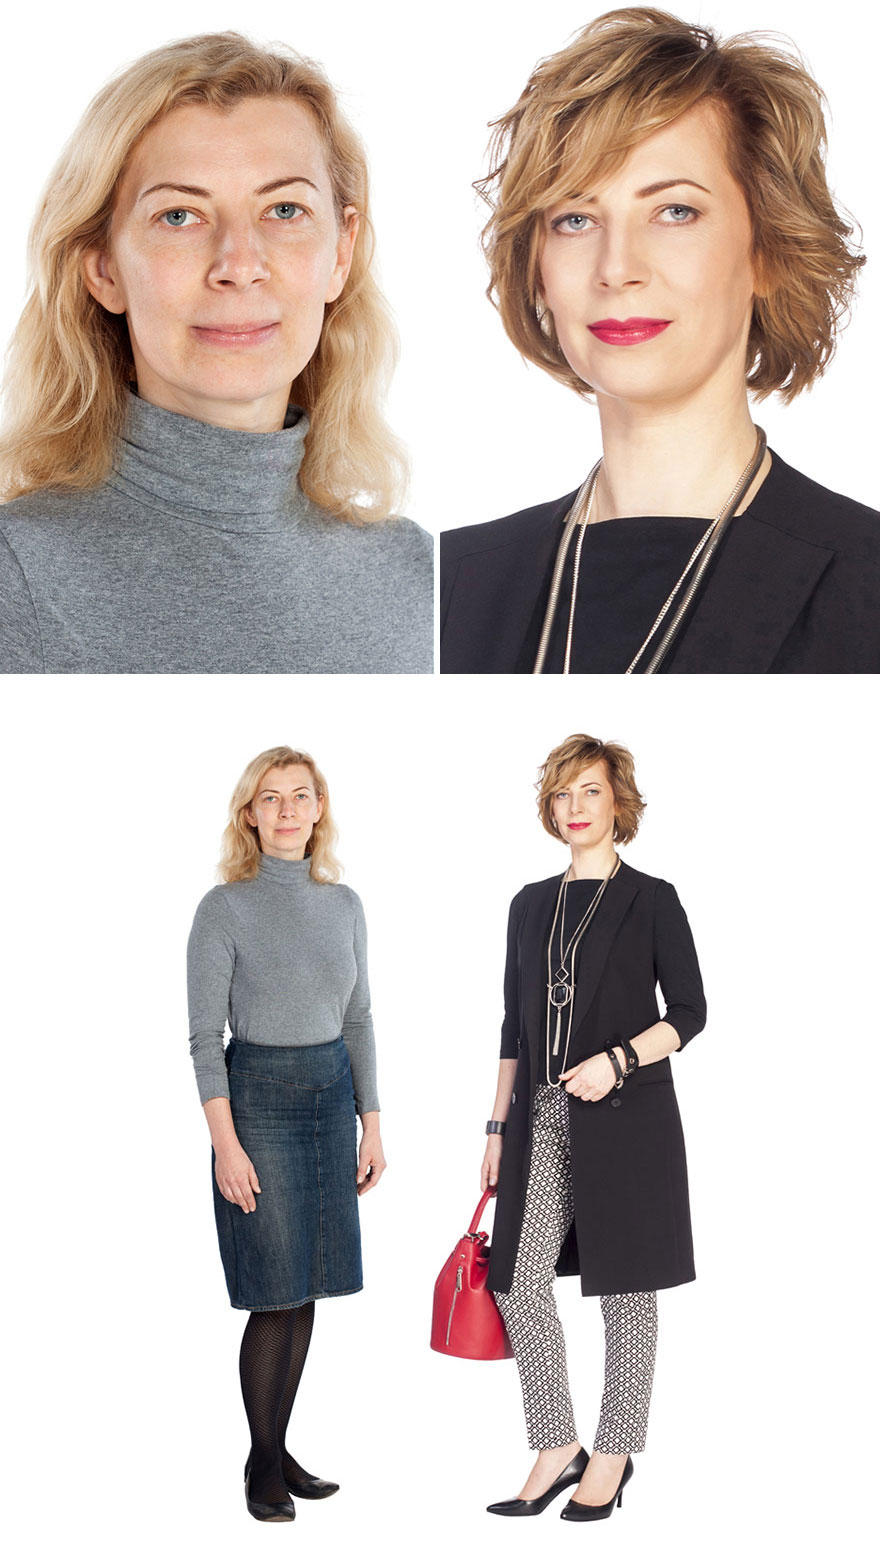 before-after-makeup-woman-style-change-konstantin-bogomolov-11